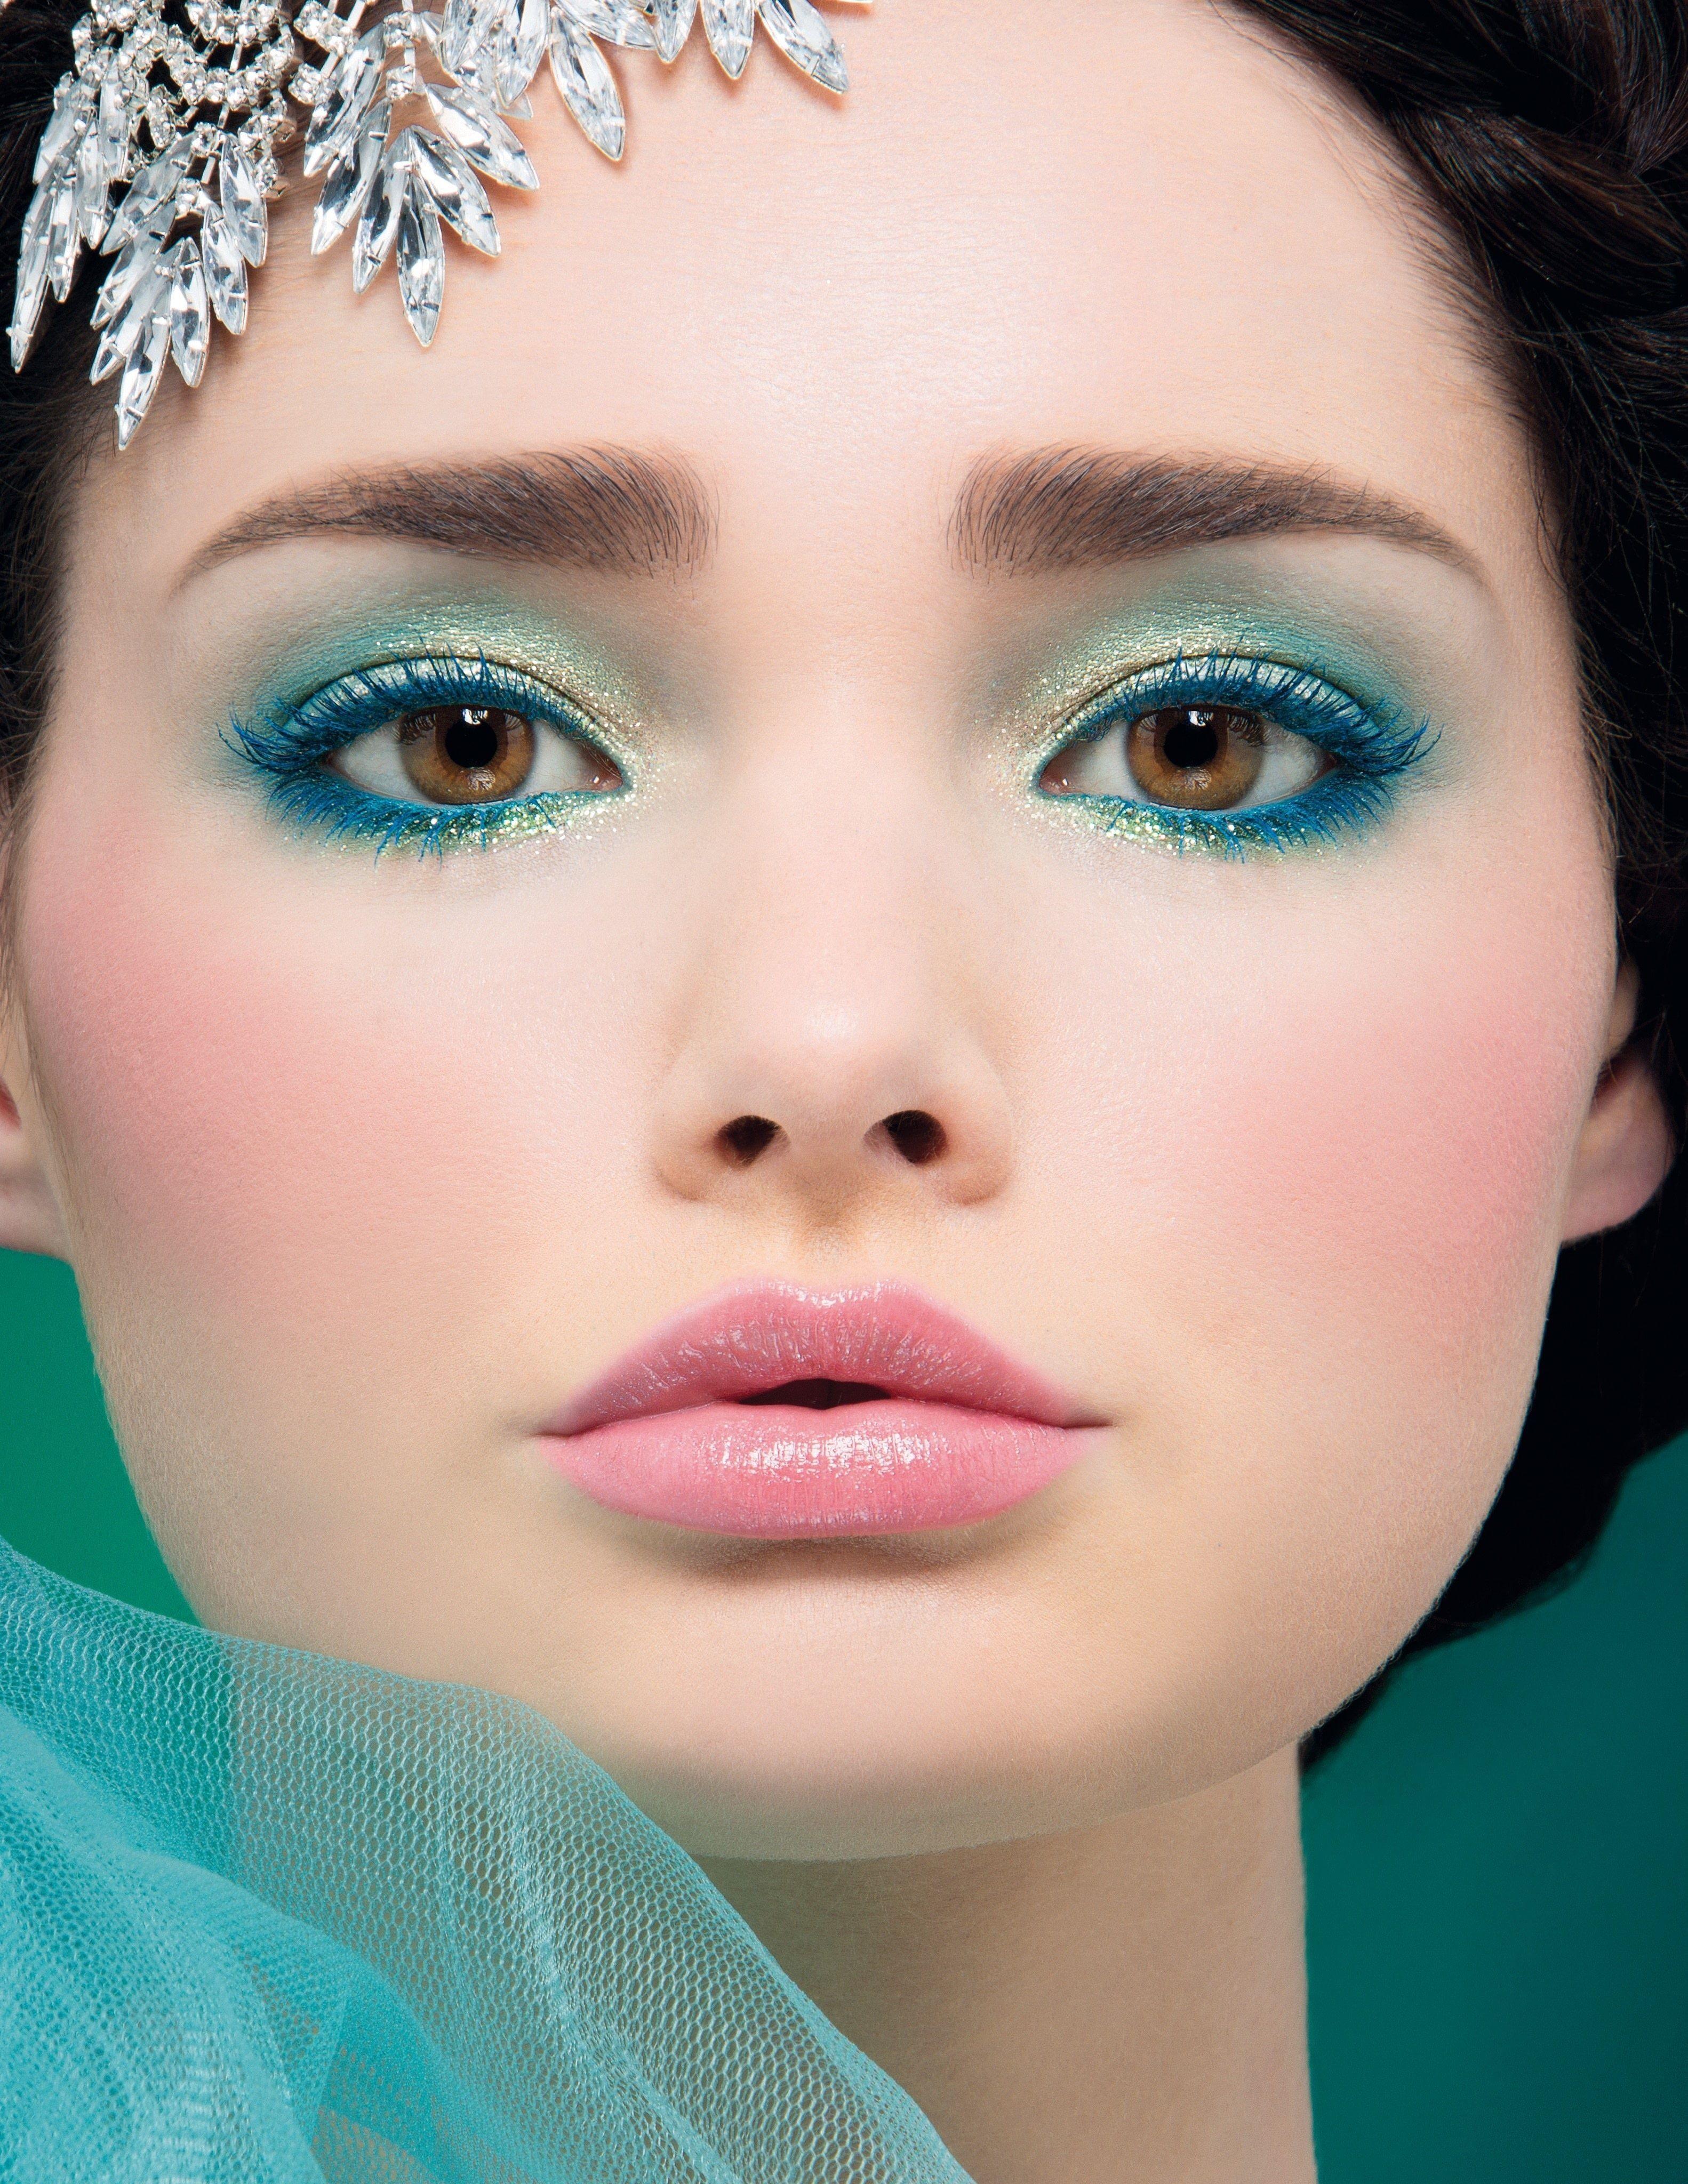 Showgirl Transformation Beauty Makeup Blue eye makeup